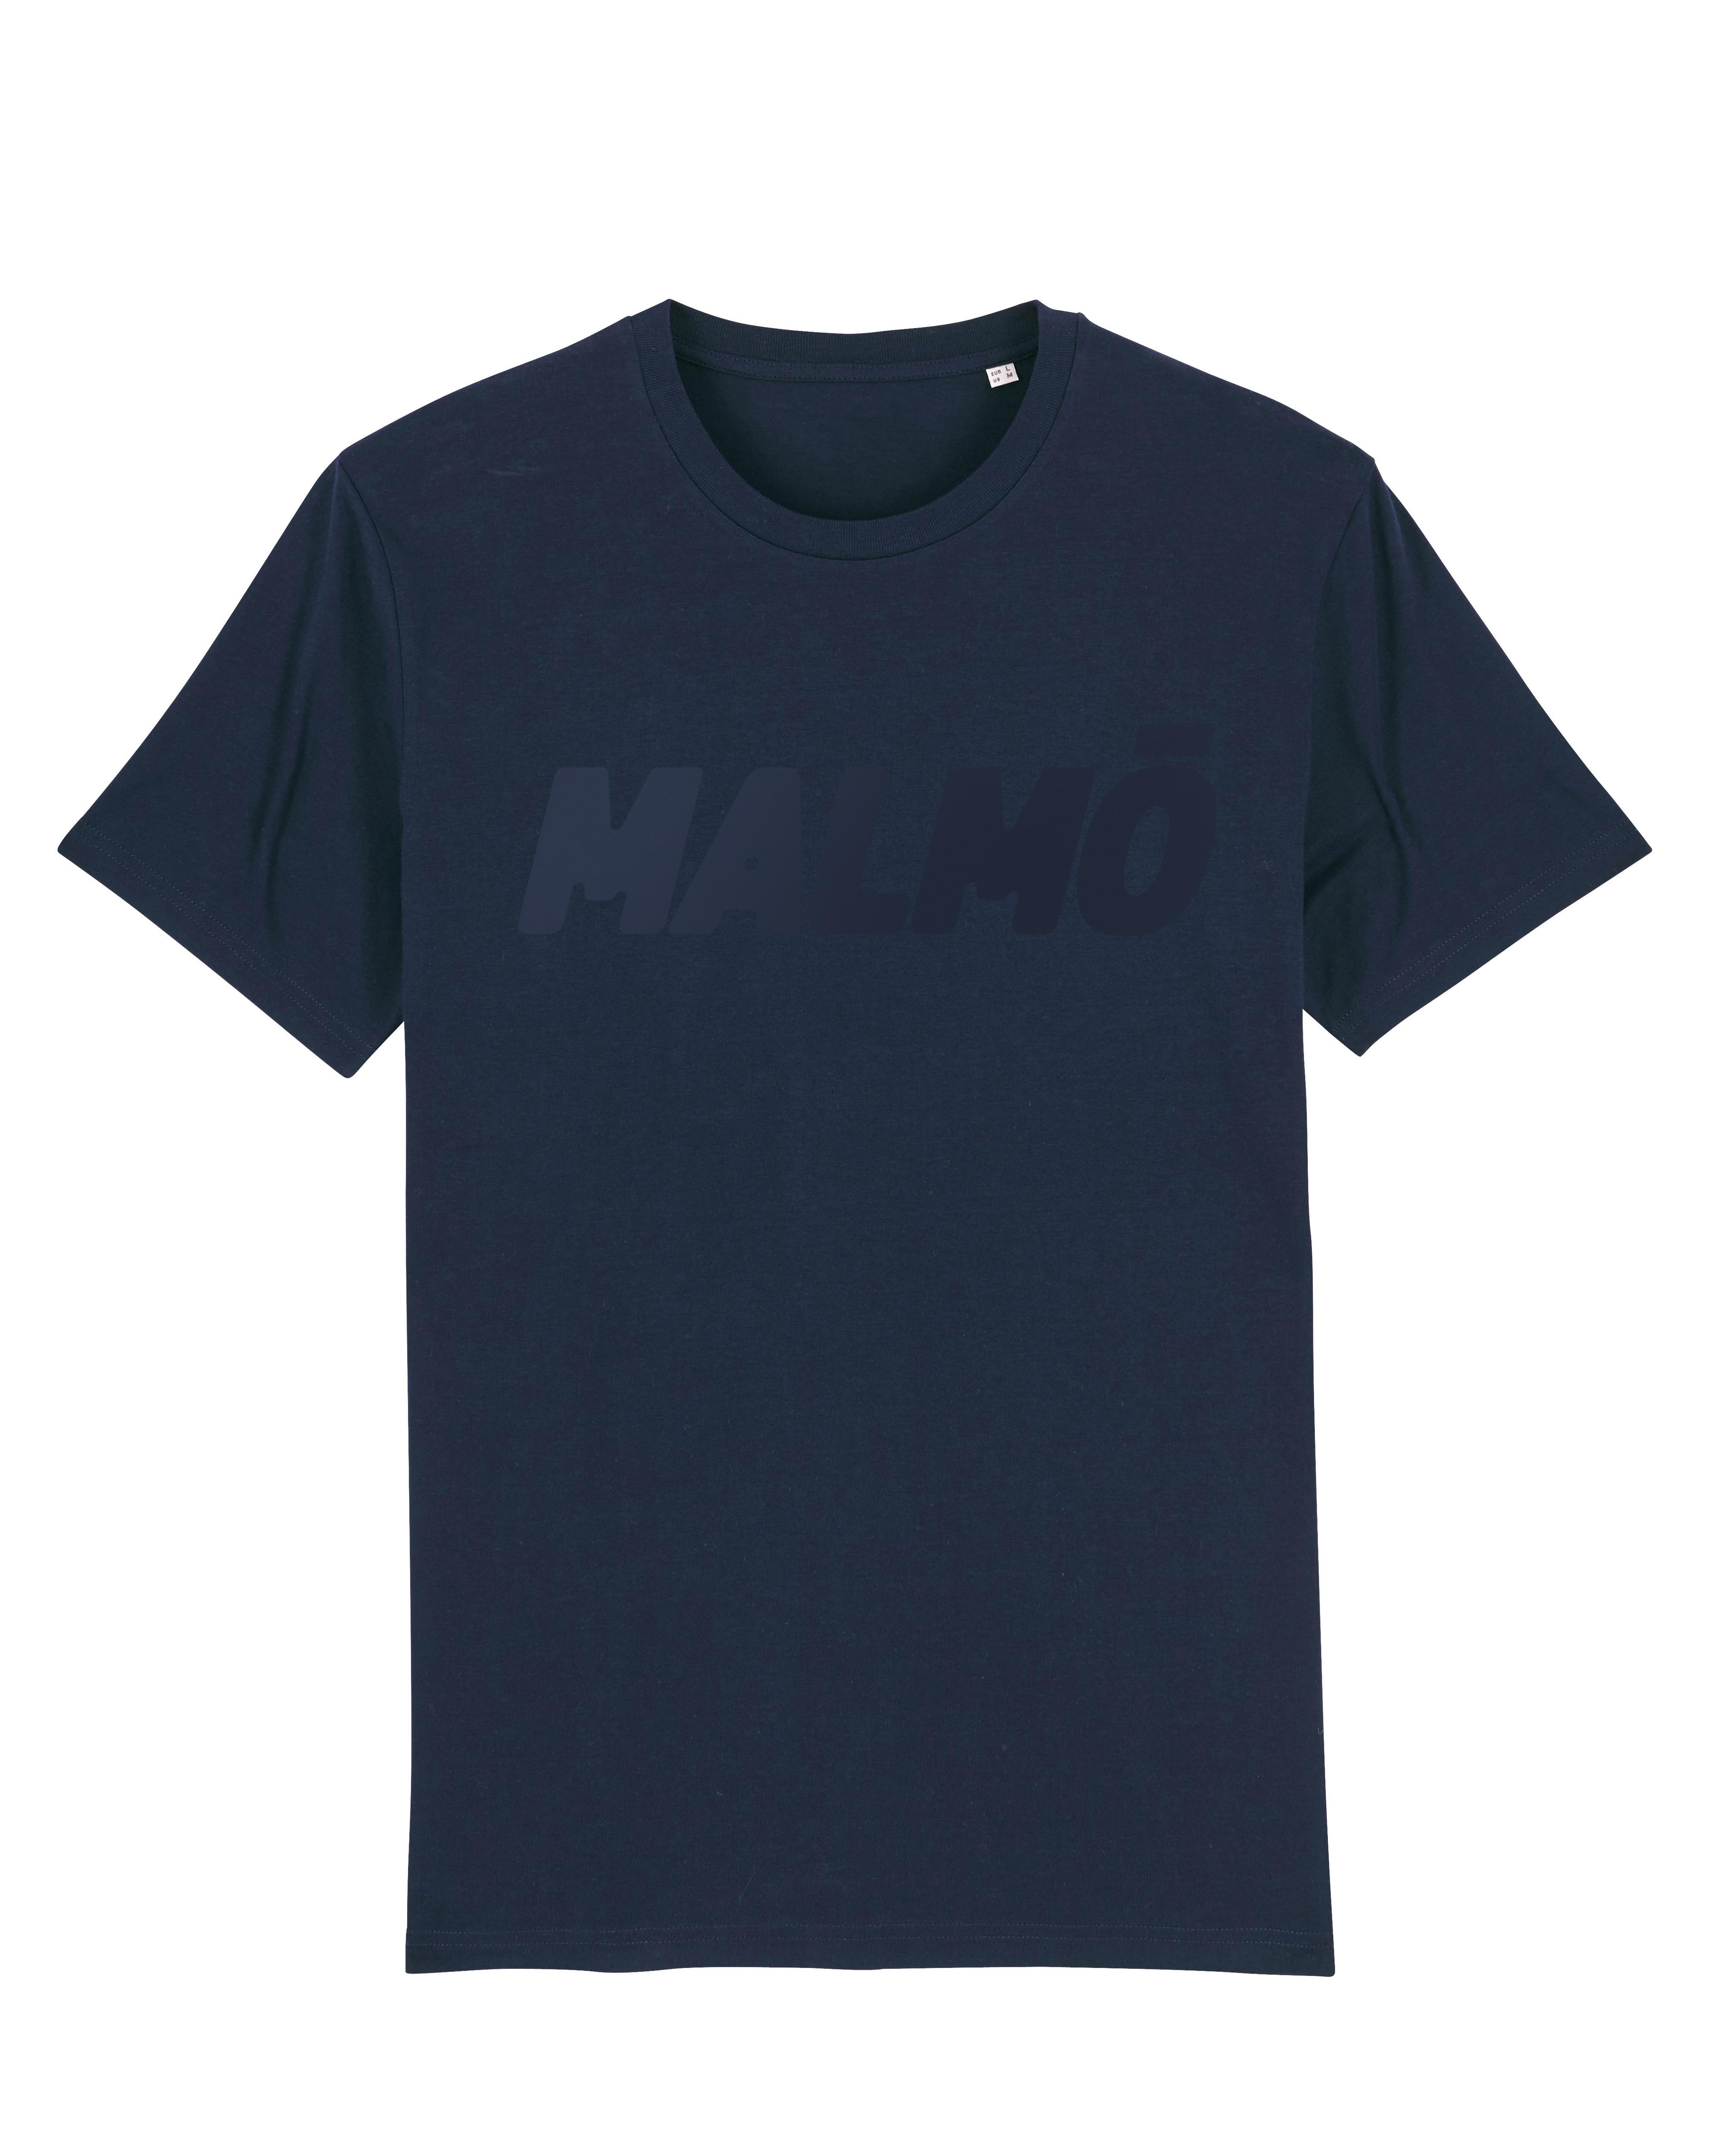 MALMÖ Ton-i-Ton - T-shirt Navy